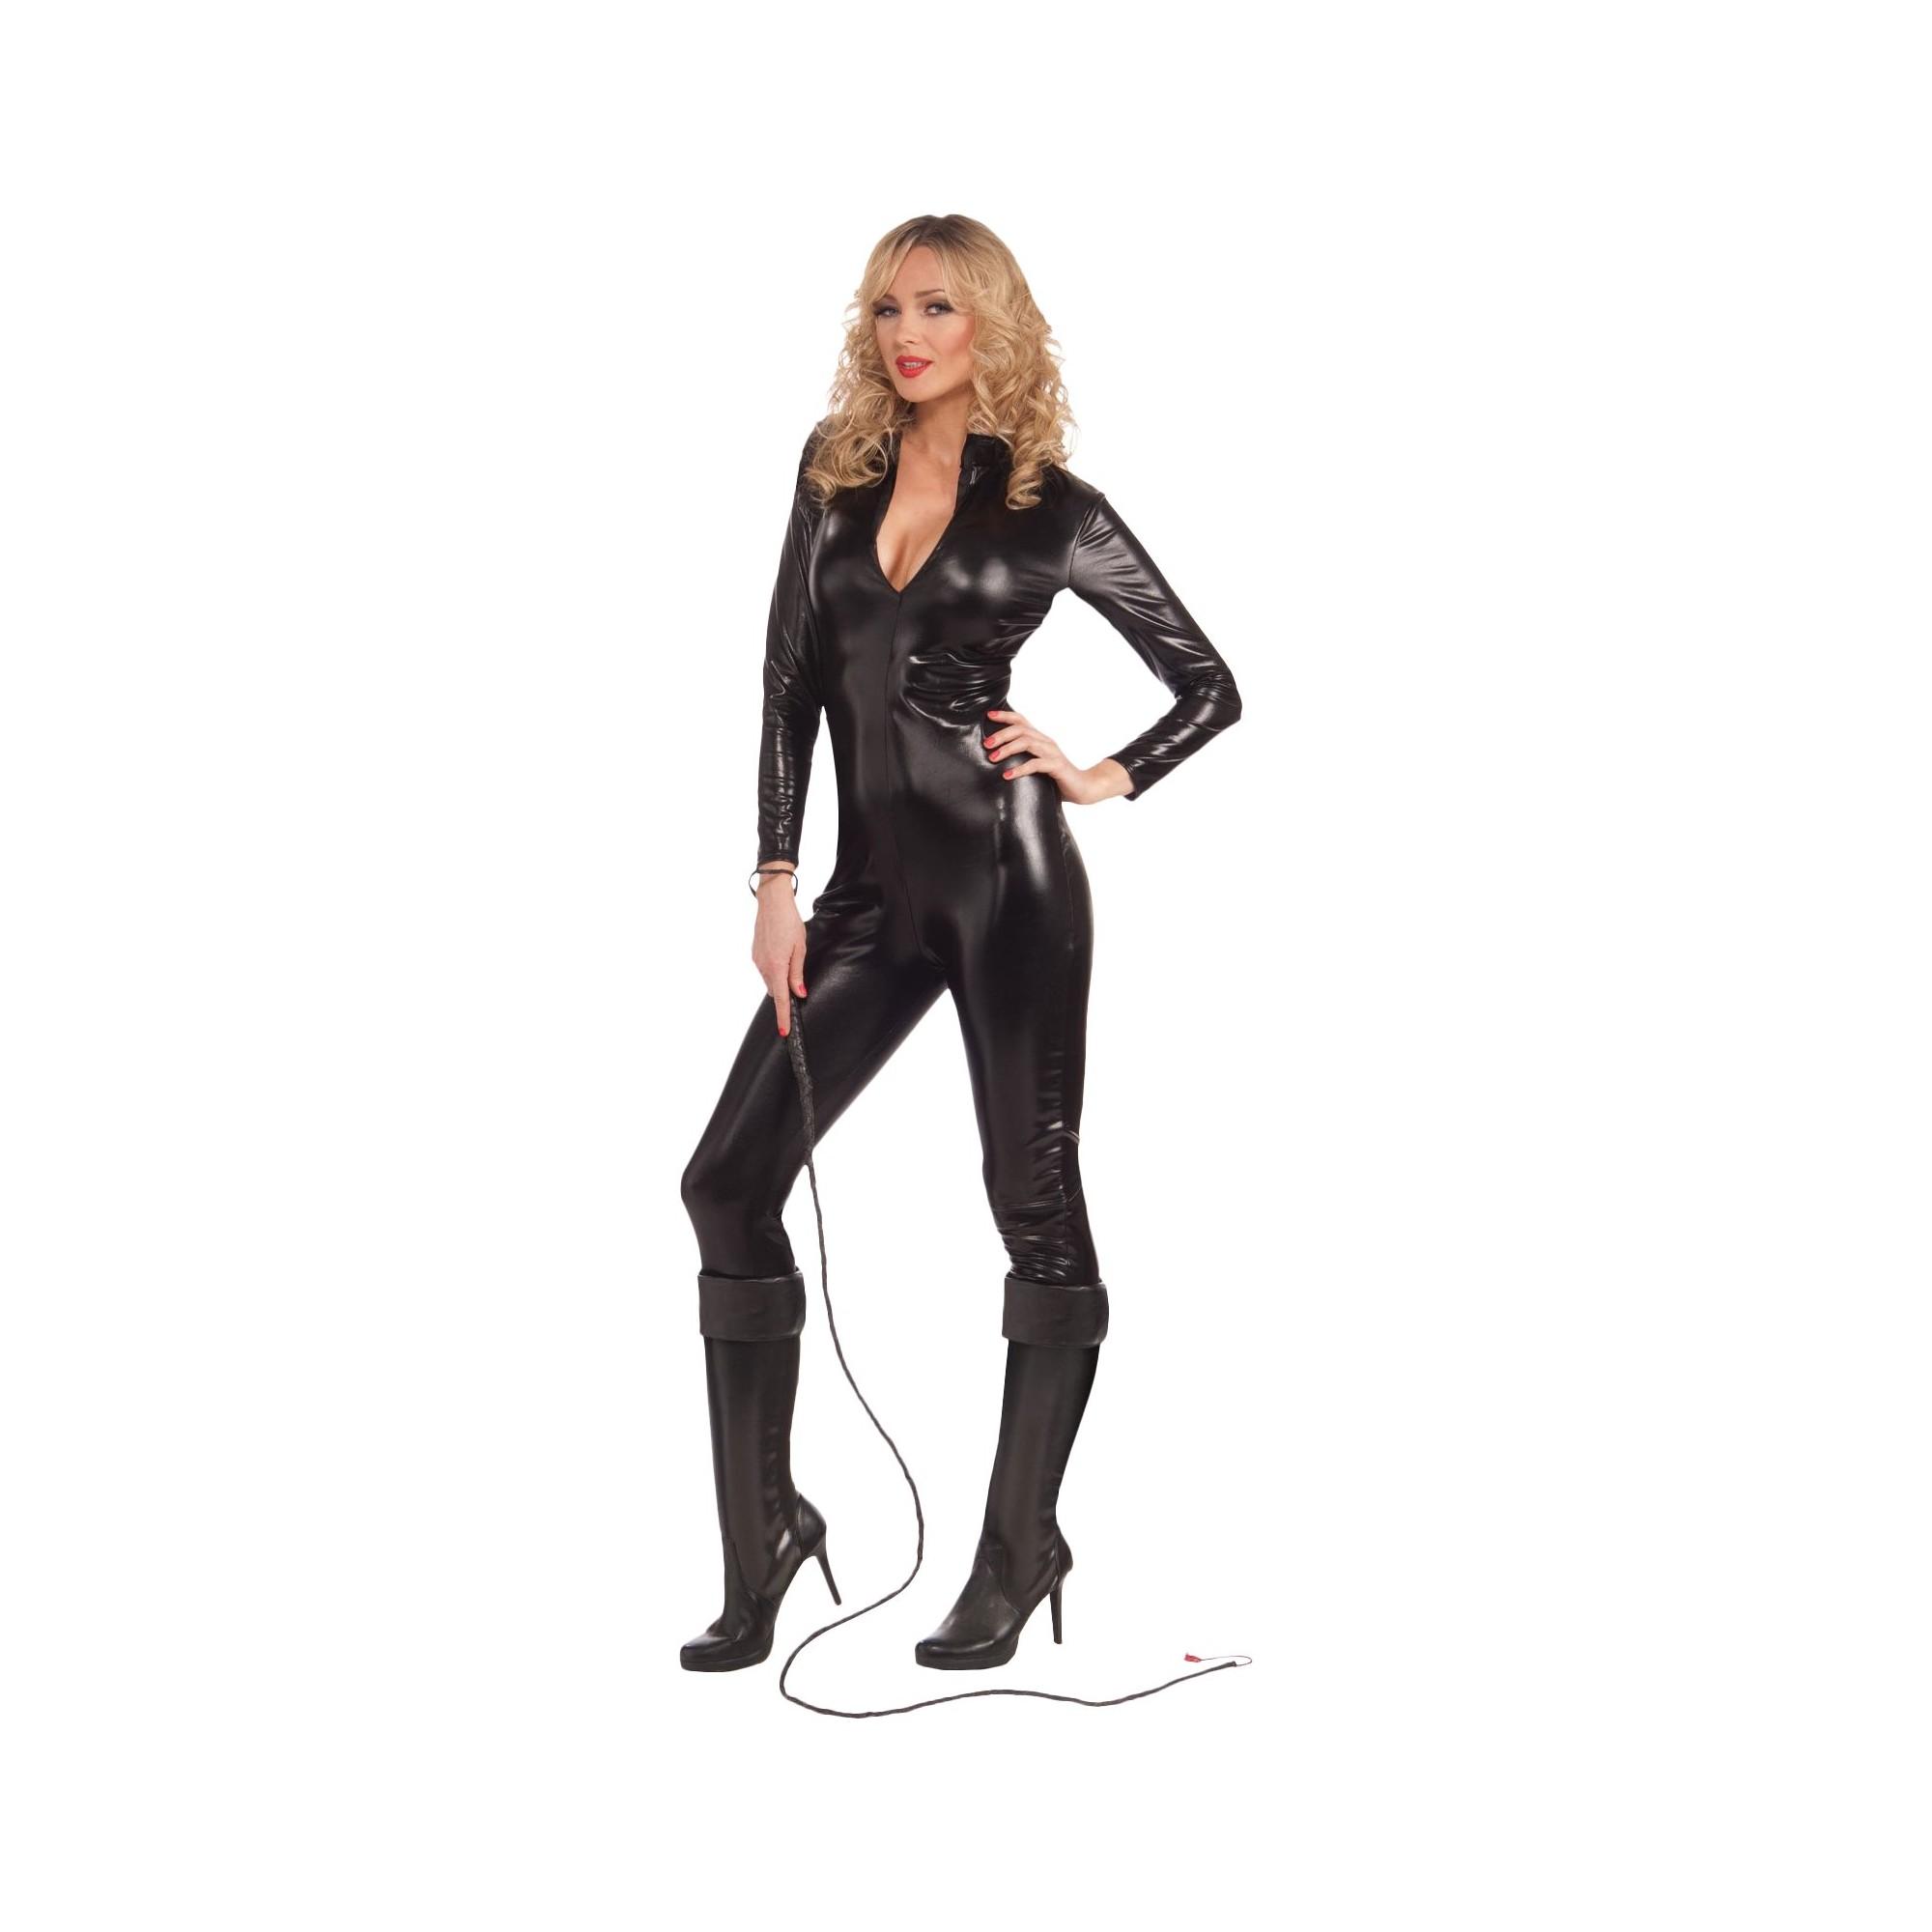 Halloween Women's Sleek N' Sassy Bodysuit Costume Small